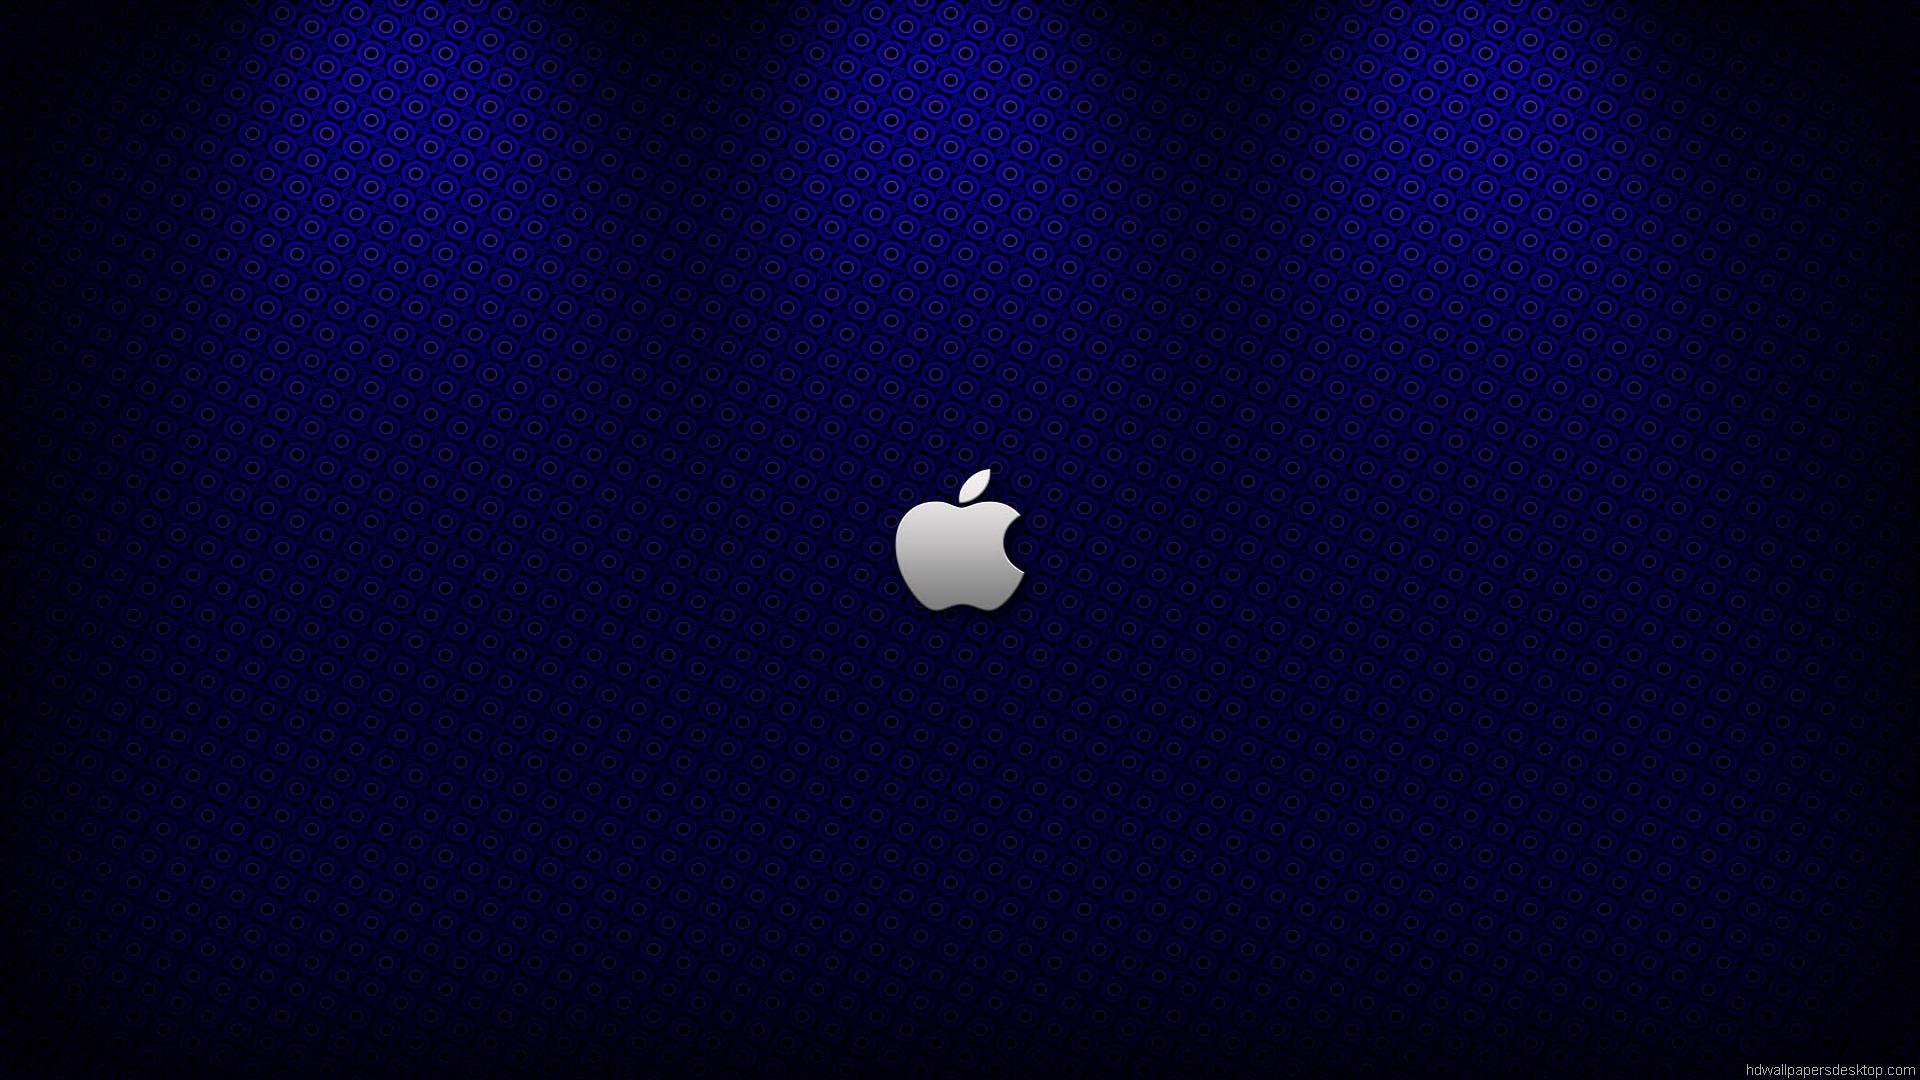 Full hd wallpapers 1080p for mac